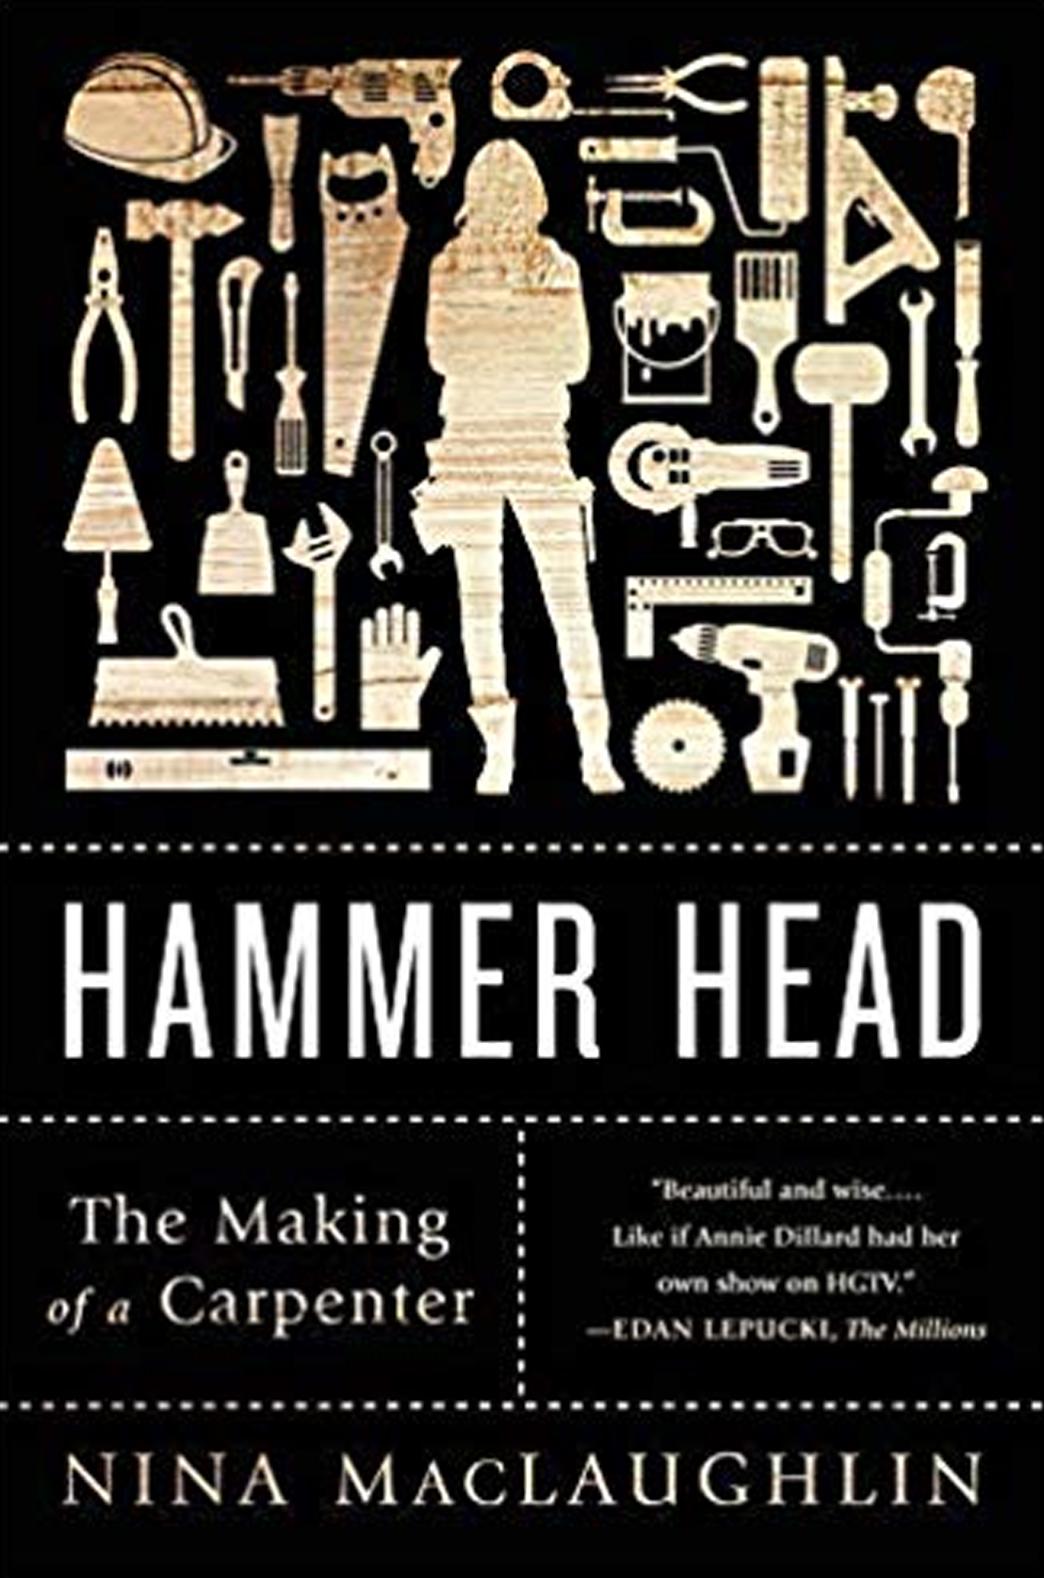 kathleen stone writer booklab literary salon hammer head nina maclaughlin